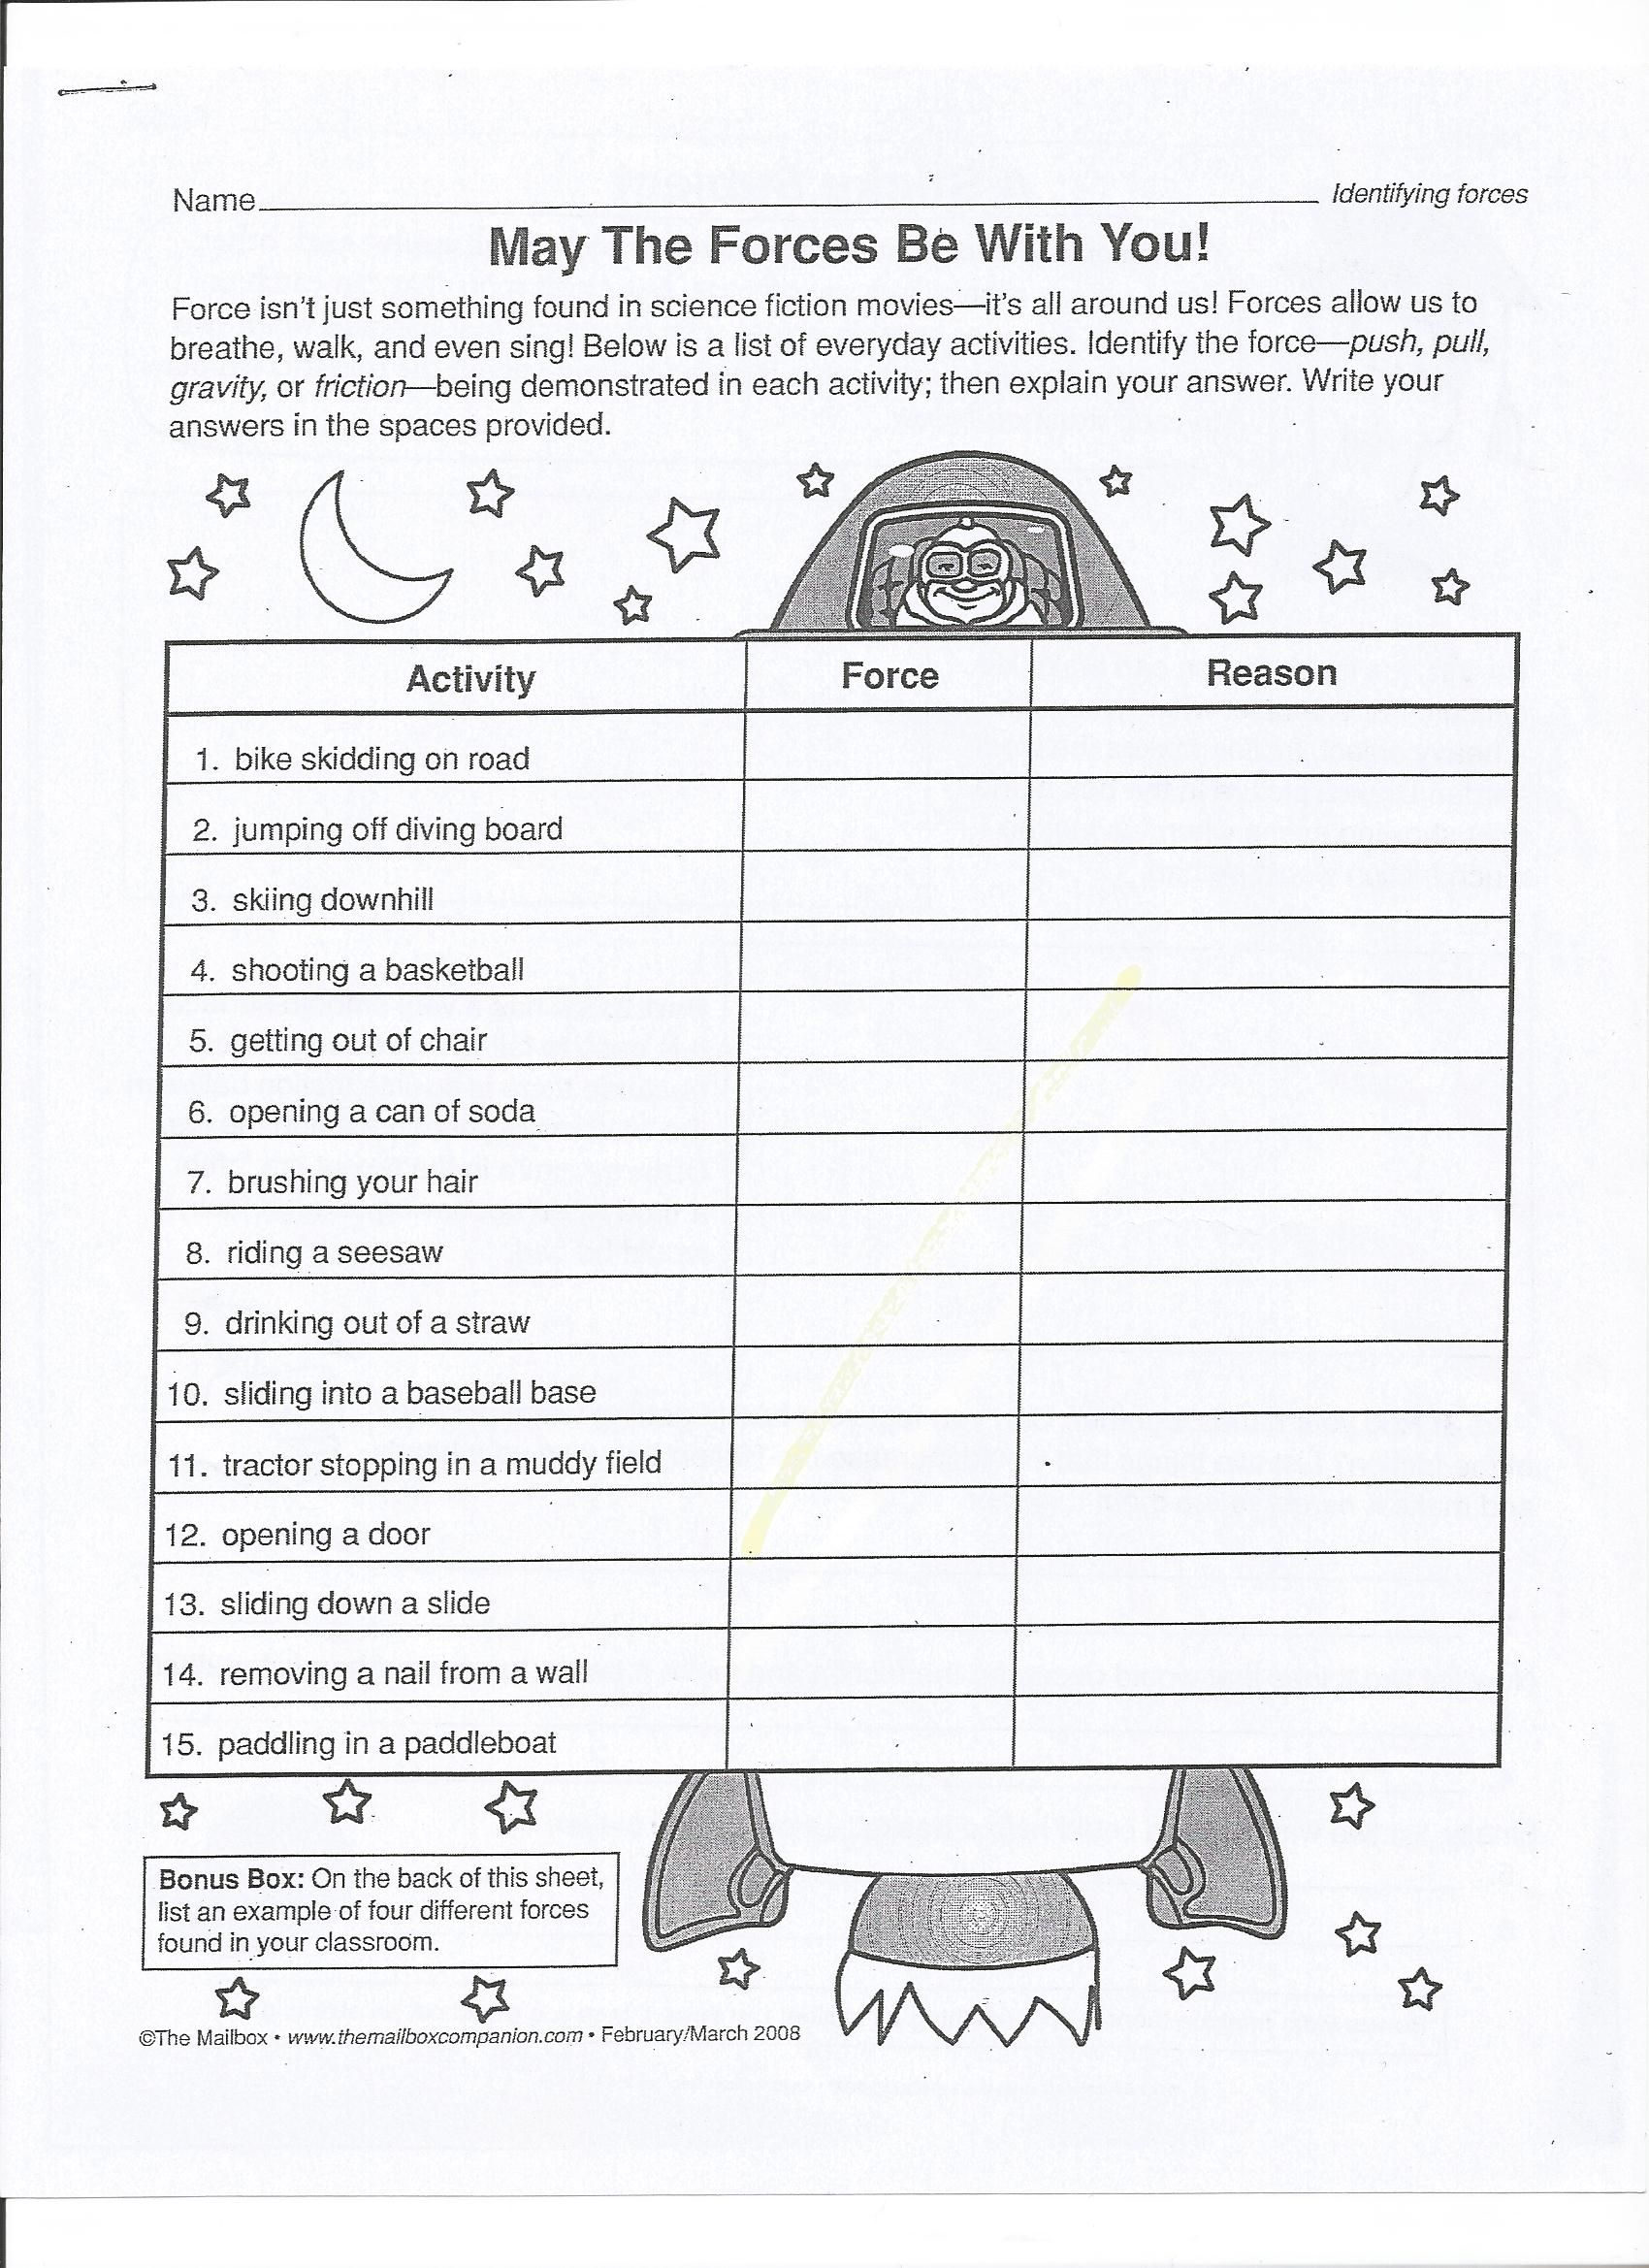 Balanced And Unbalanced Forces Worksheet 13 Jpg 1700 2338 Force And Motion Science Worksheets Social Studies Worksheets